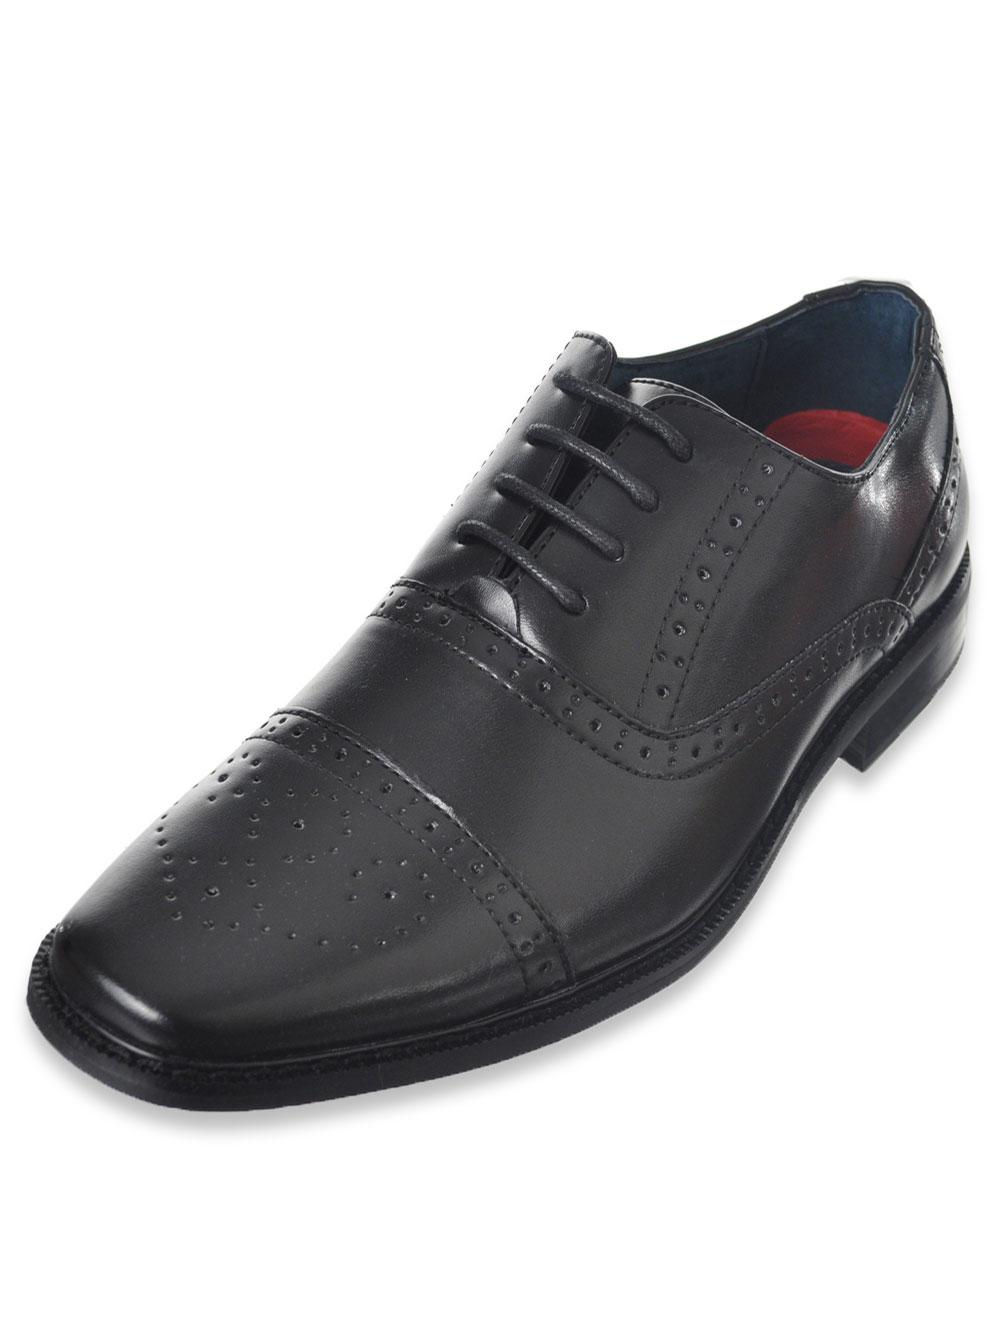 joseph allen boys quot worsted flourish quot dress shoes youth